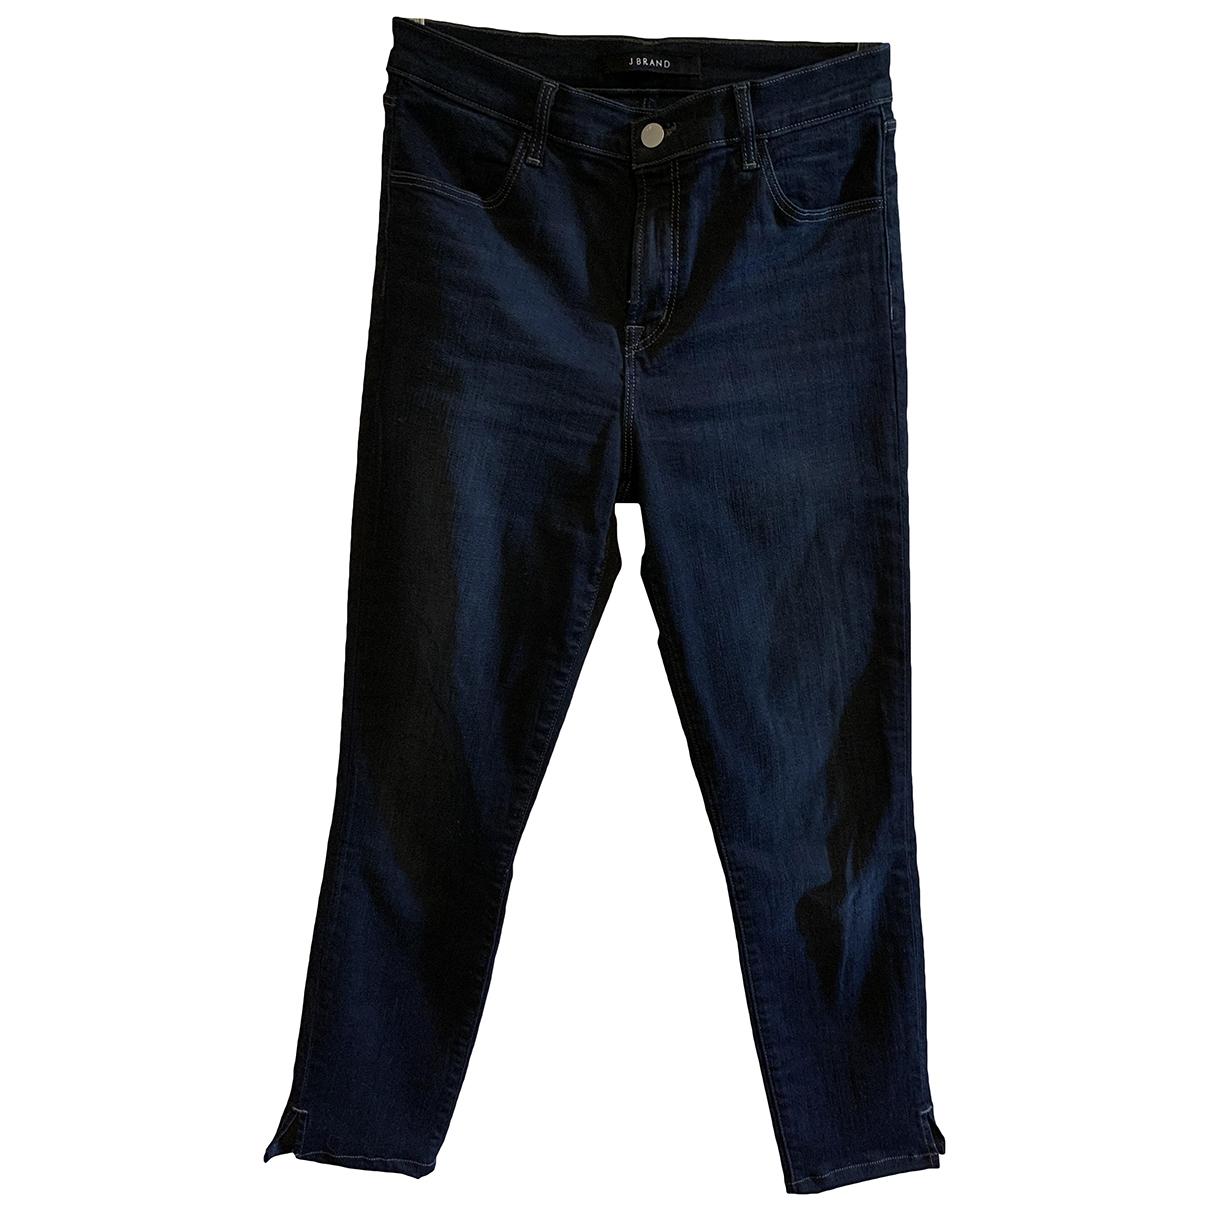 J Brand \N Navy Cotton - elasthane Jeans for Women 28 US